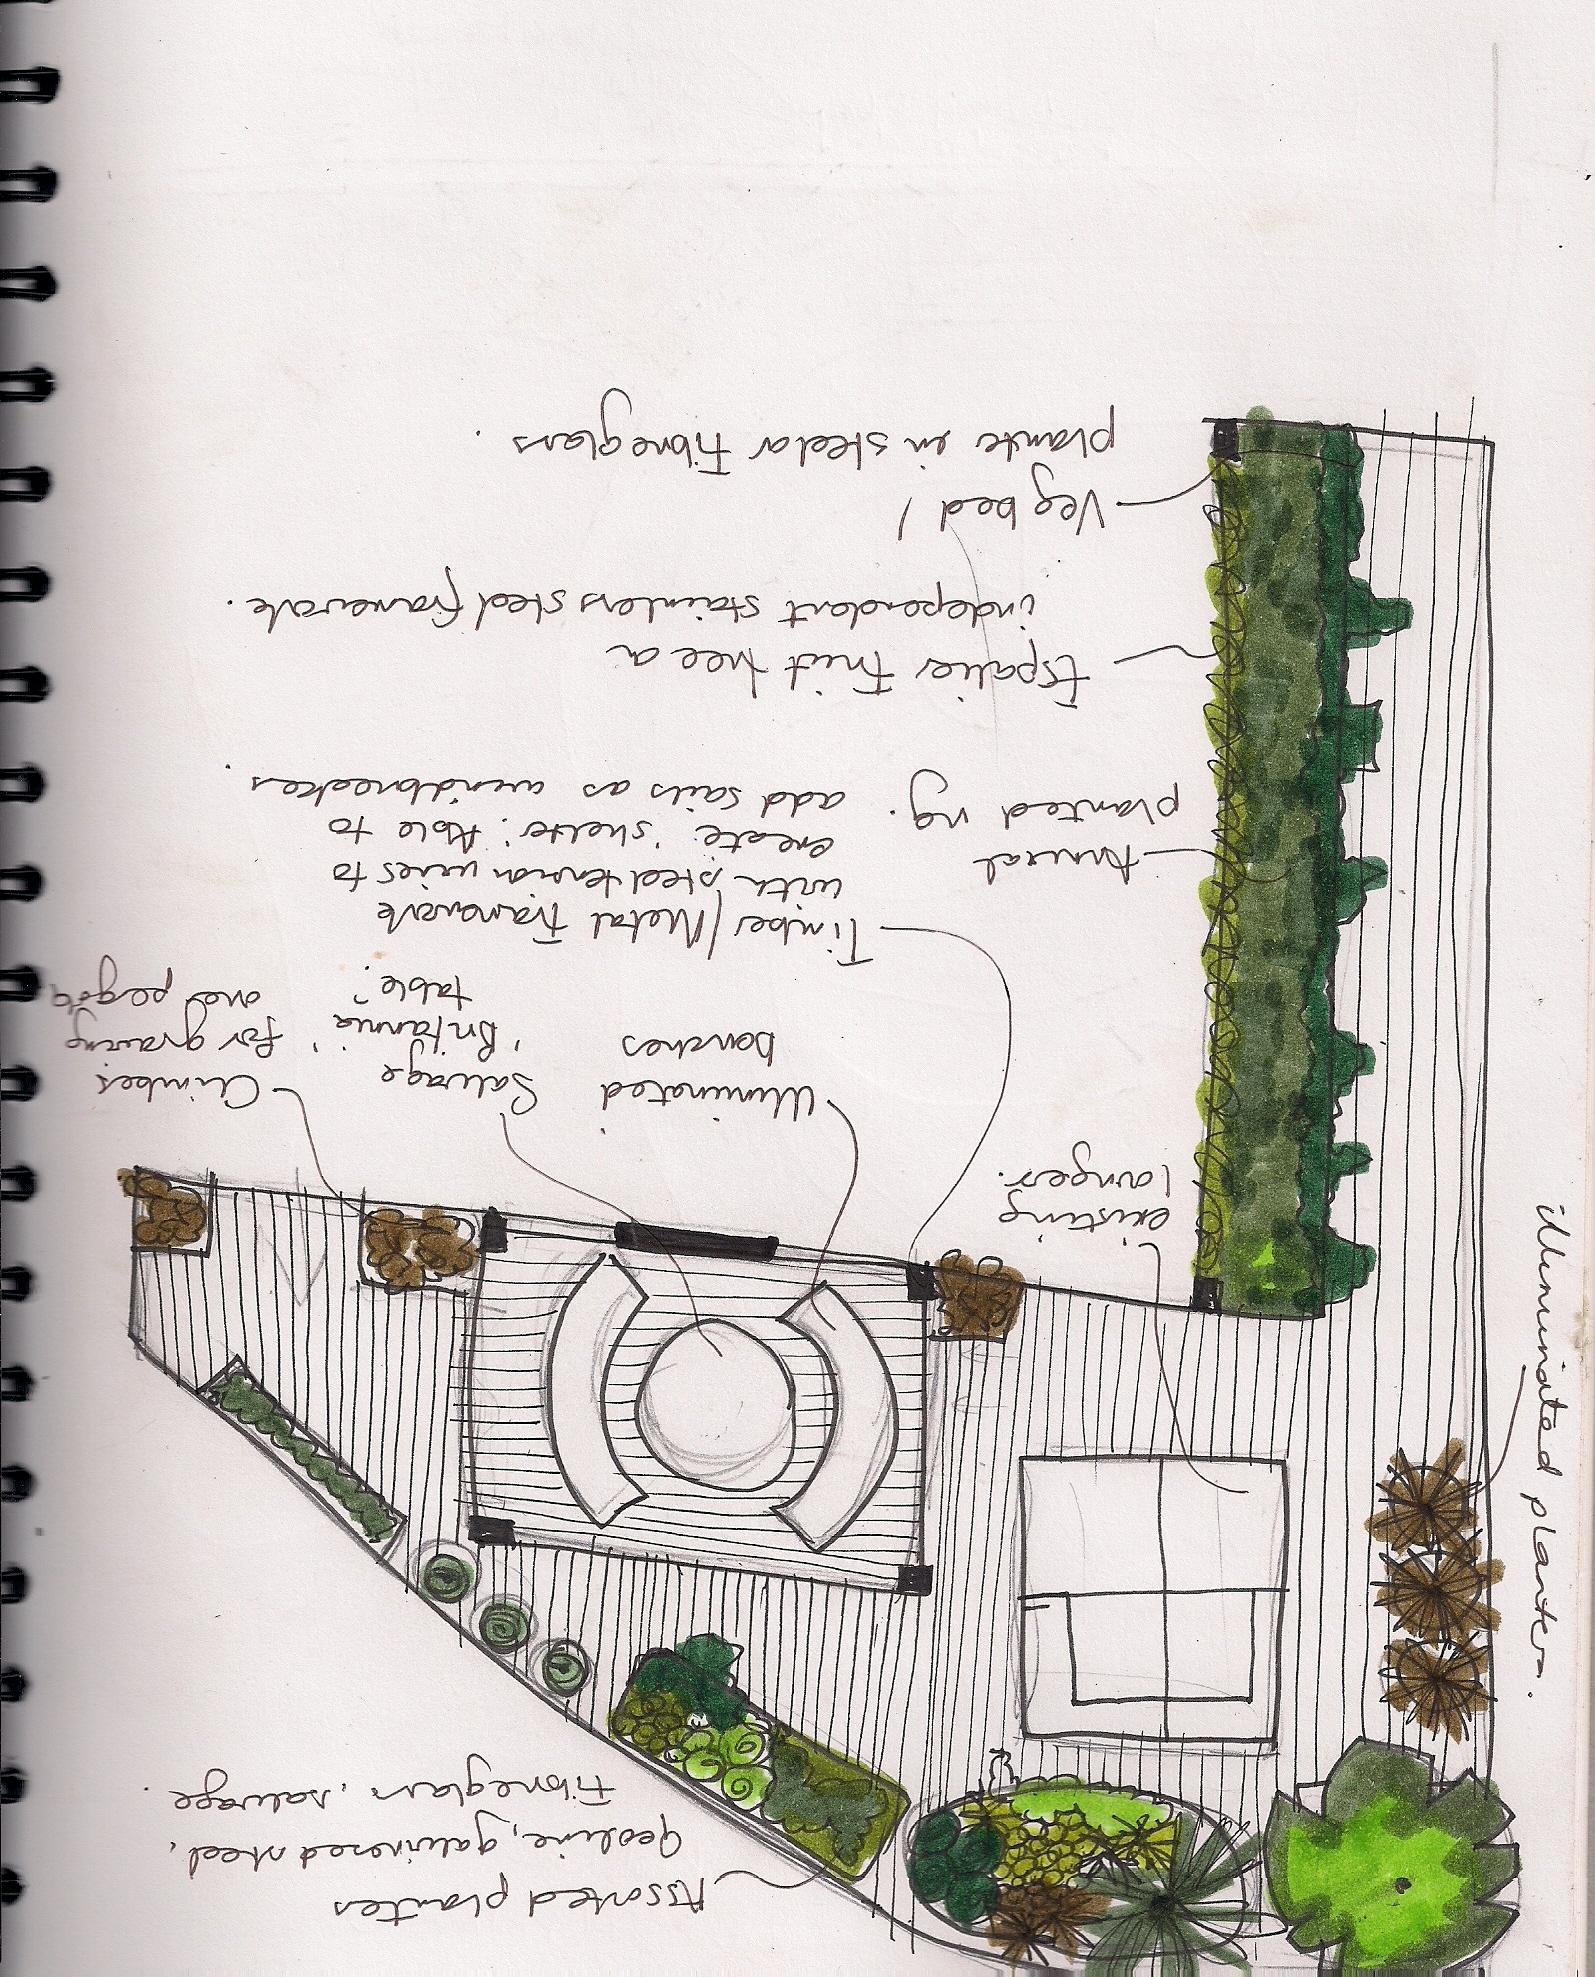 East london roof garden what shall we do earth for Garden design east london